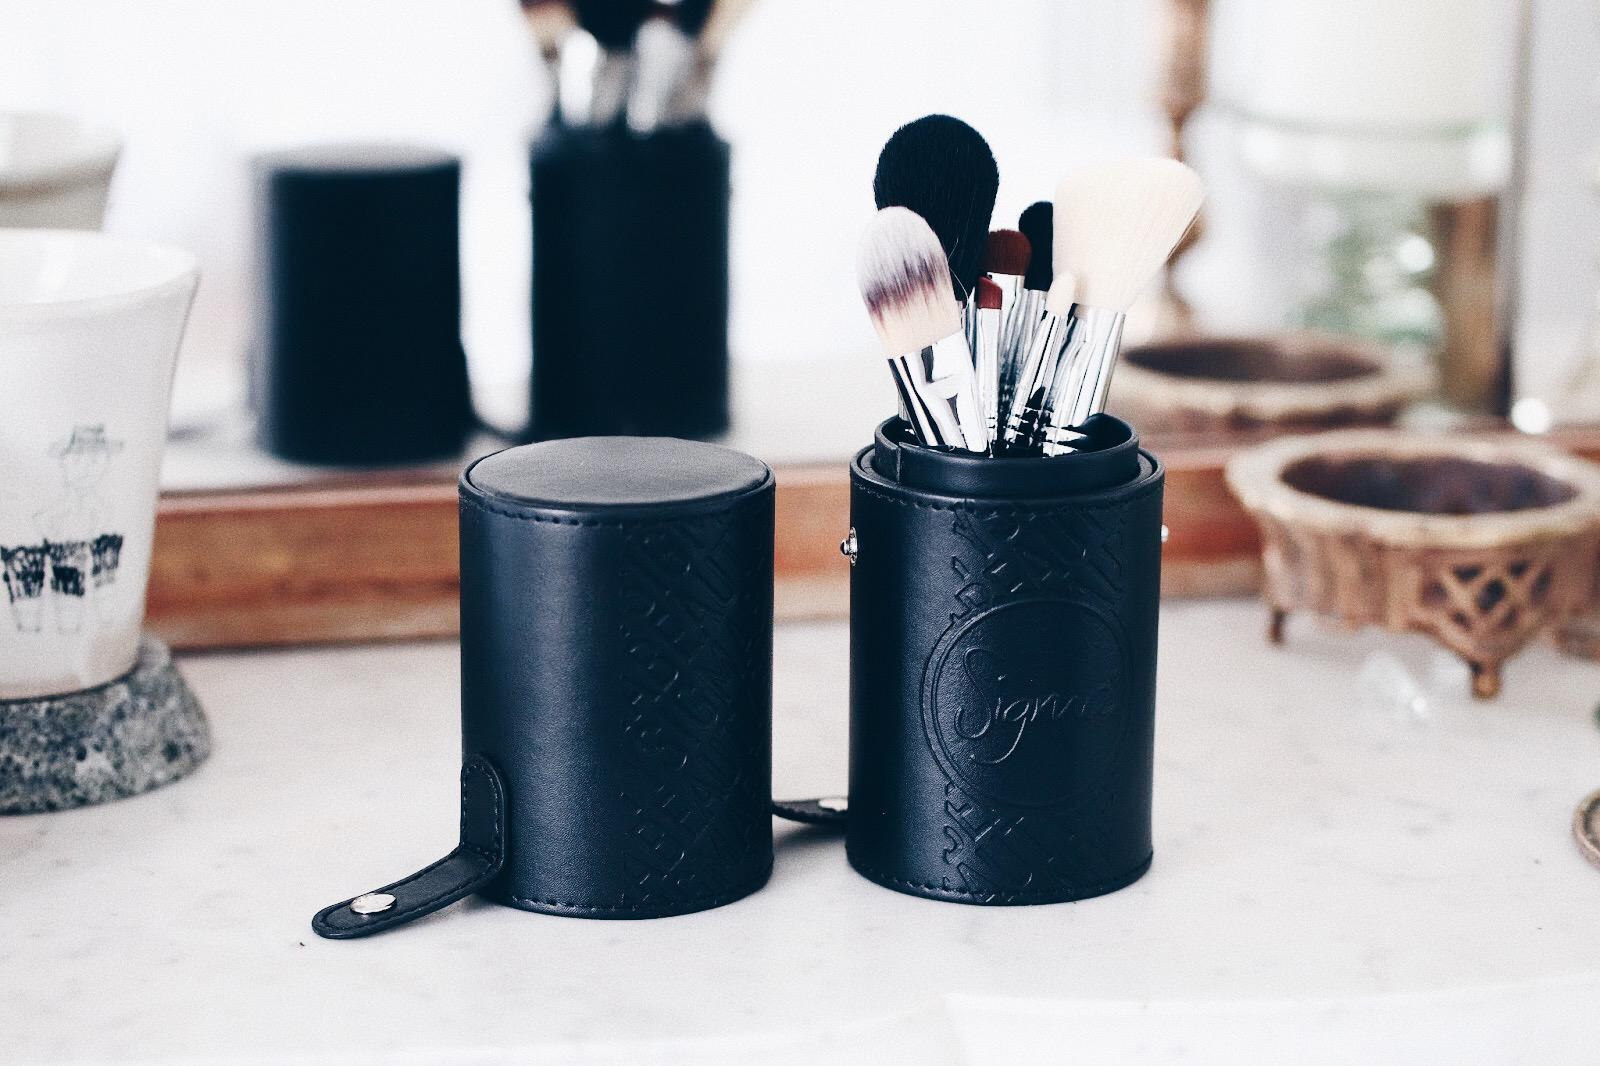 sigma pinceaux maquillage avis test